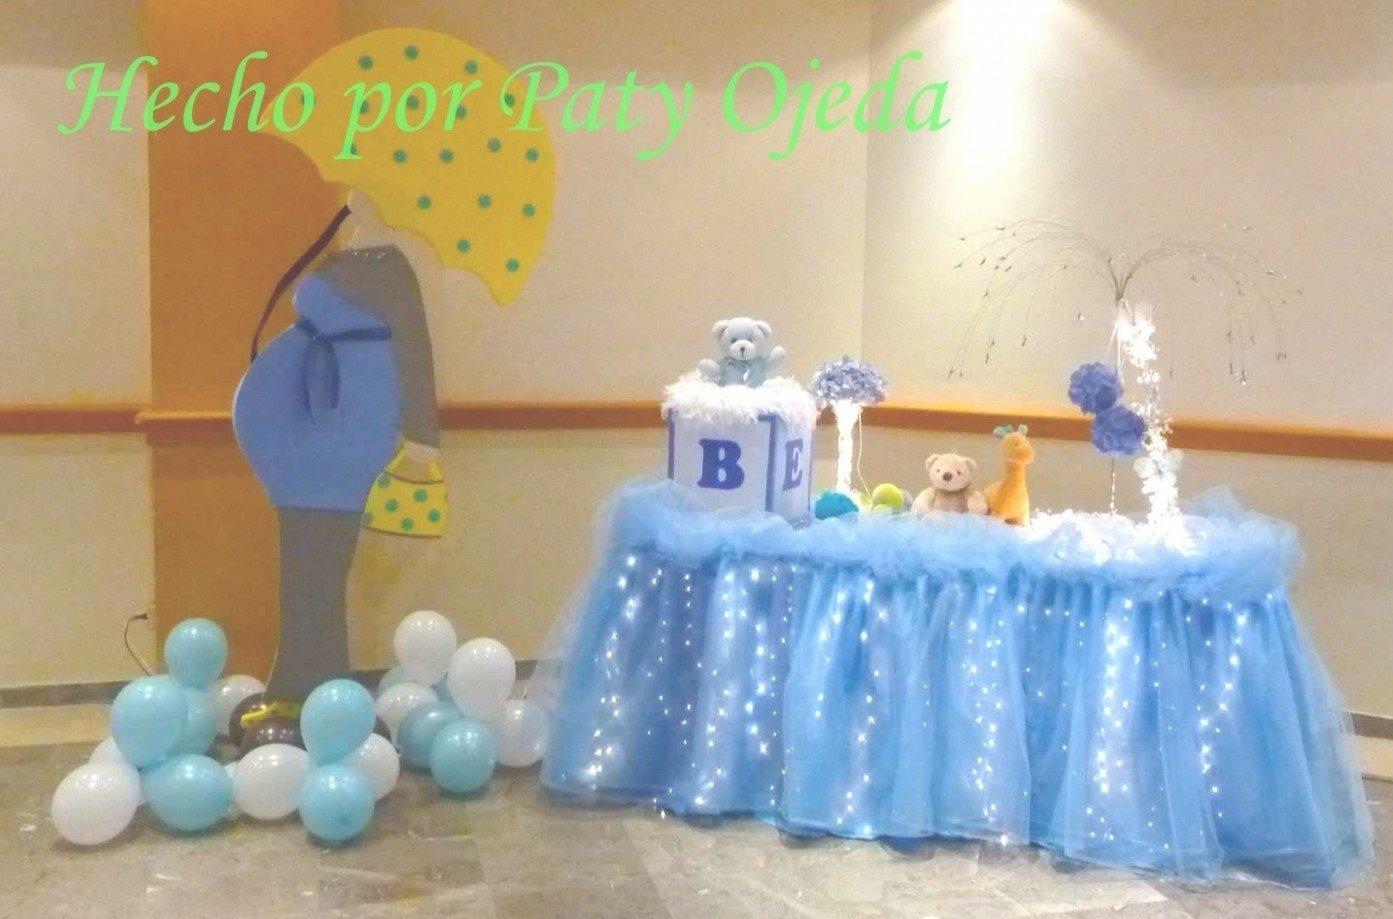 10 Trendy Ideas Para Decorar Baby Shower epic ideas para decorar baby shower wblqual throughout decoracion 2020